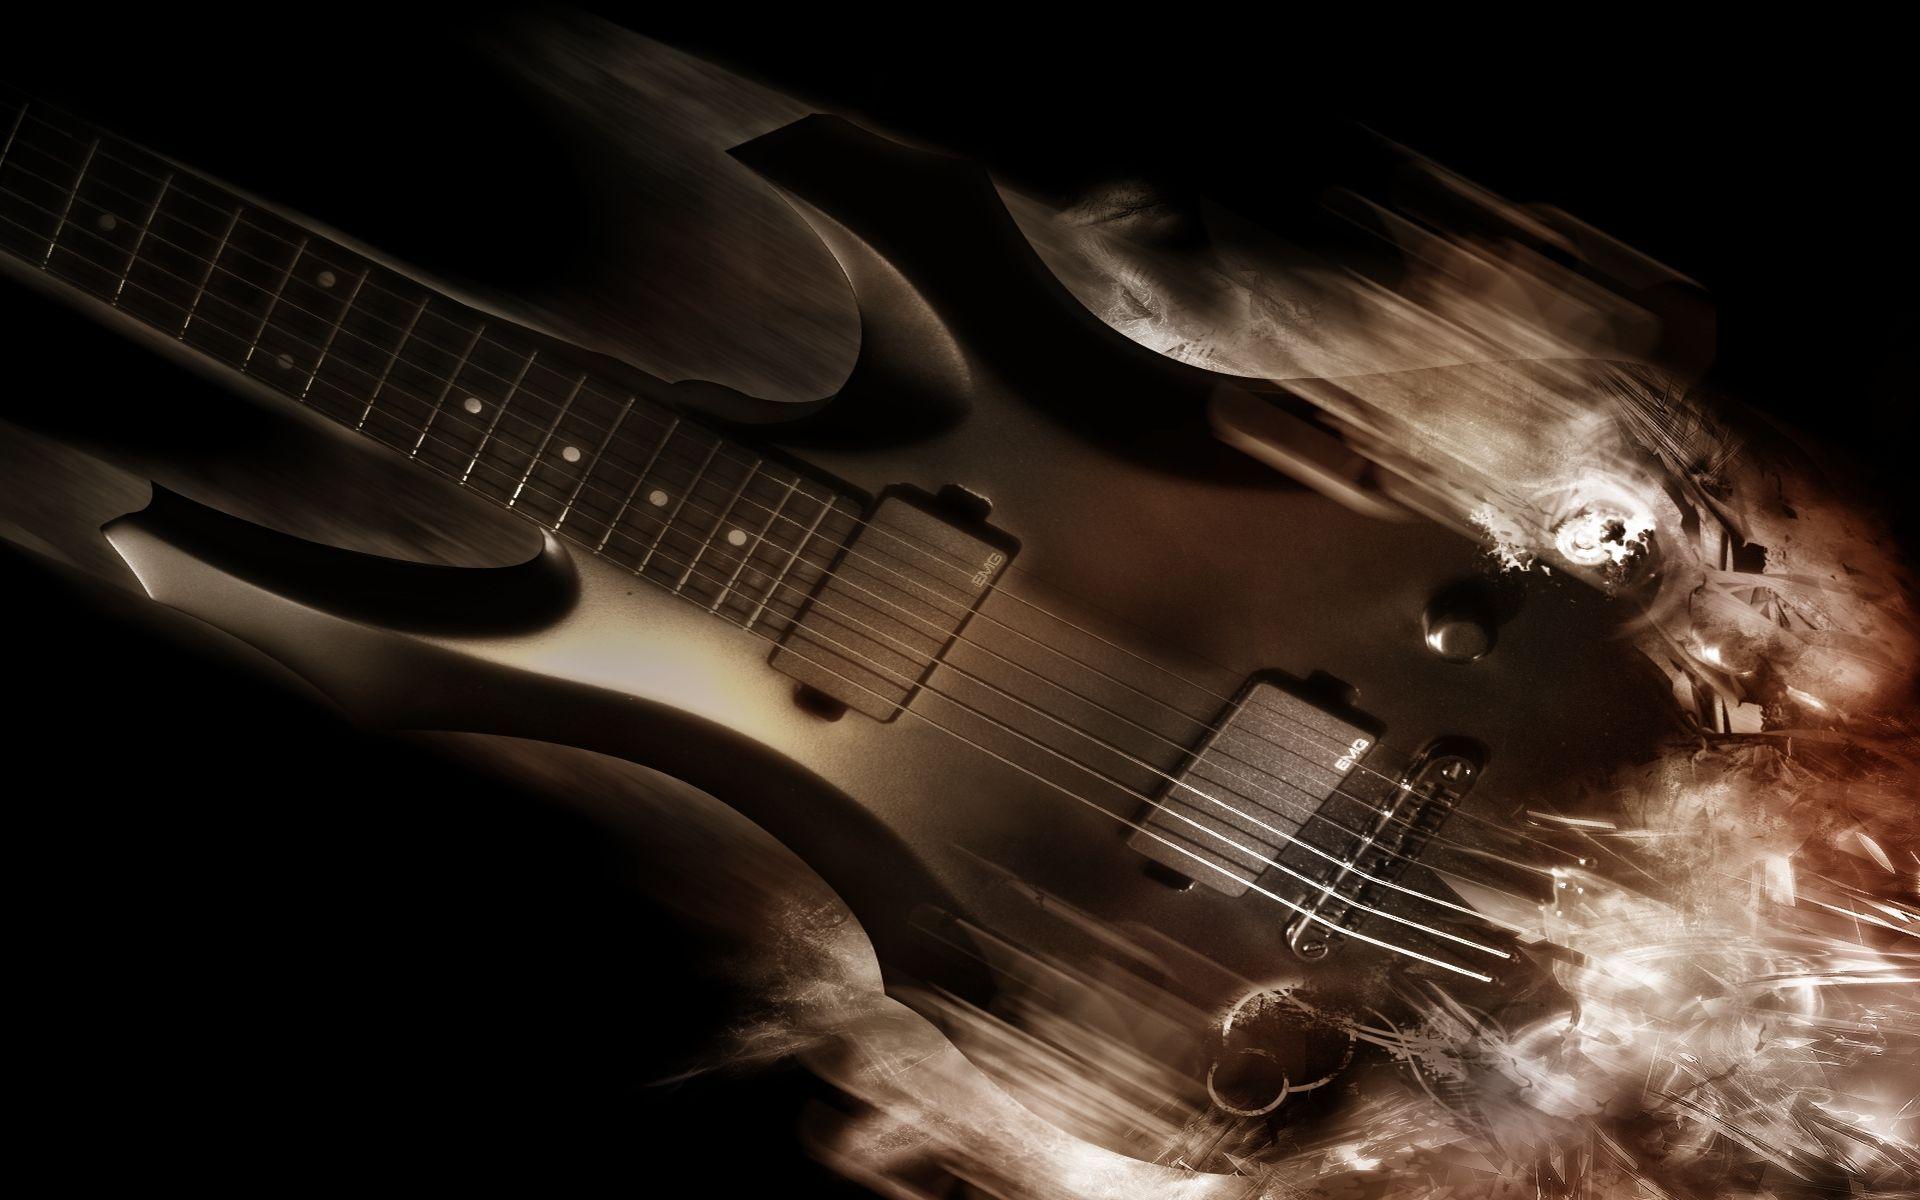 Guitar Abstract, Computer Wallpaper